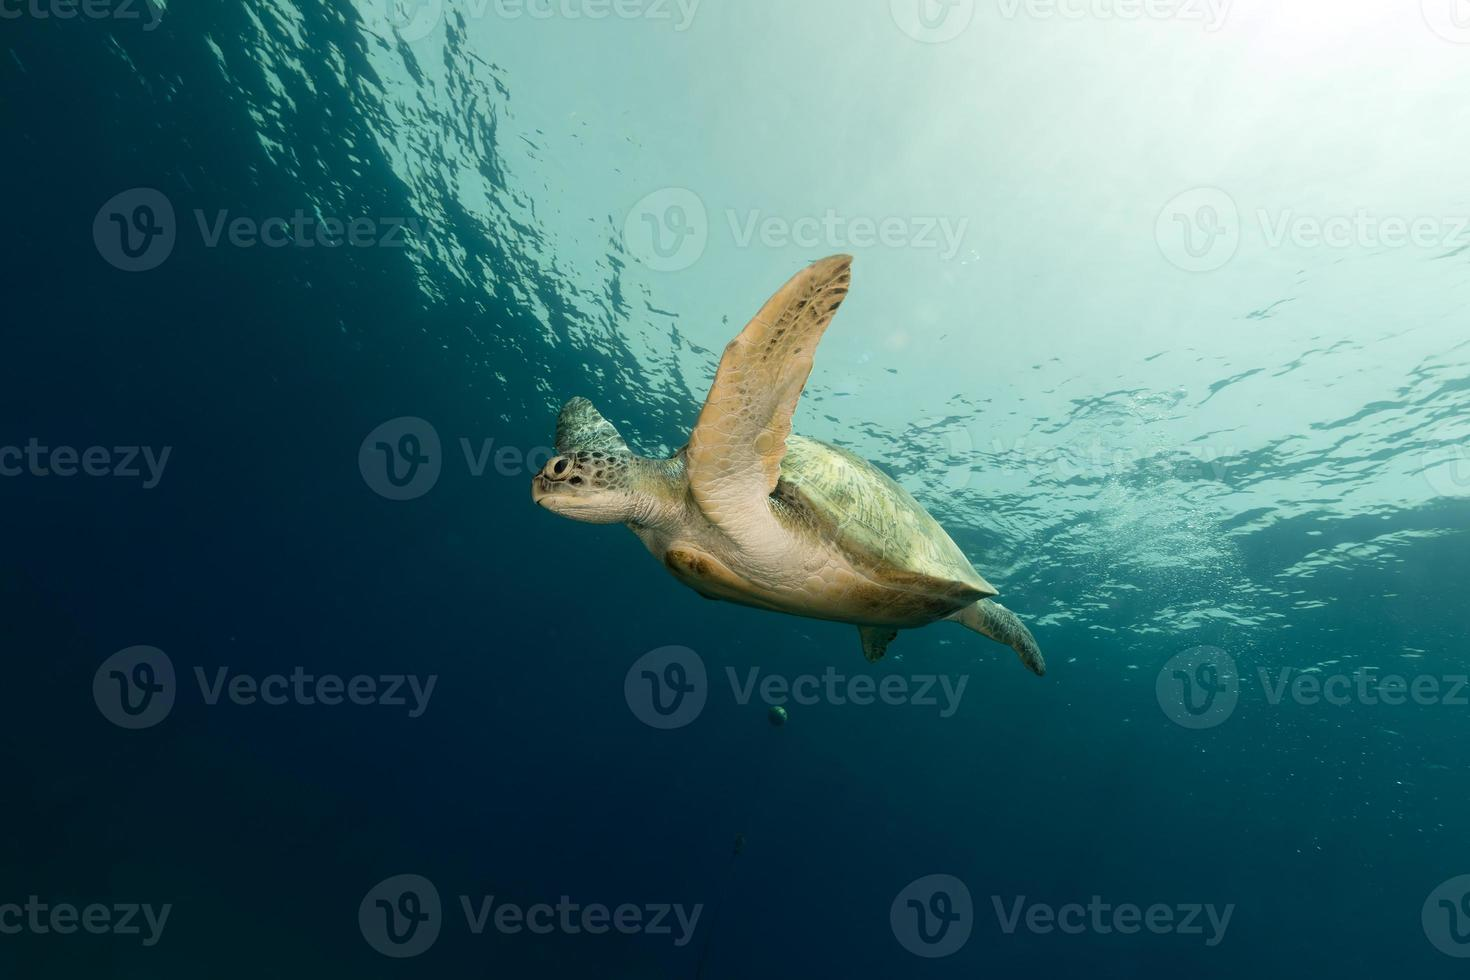 hembra tortuga verde en el mar rojo. foto